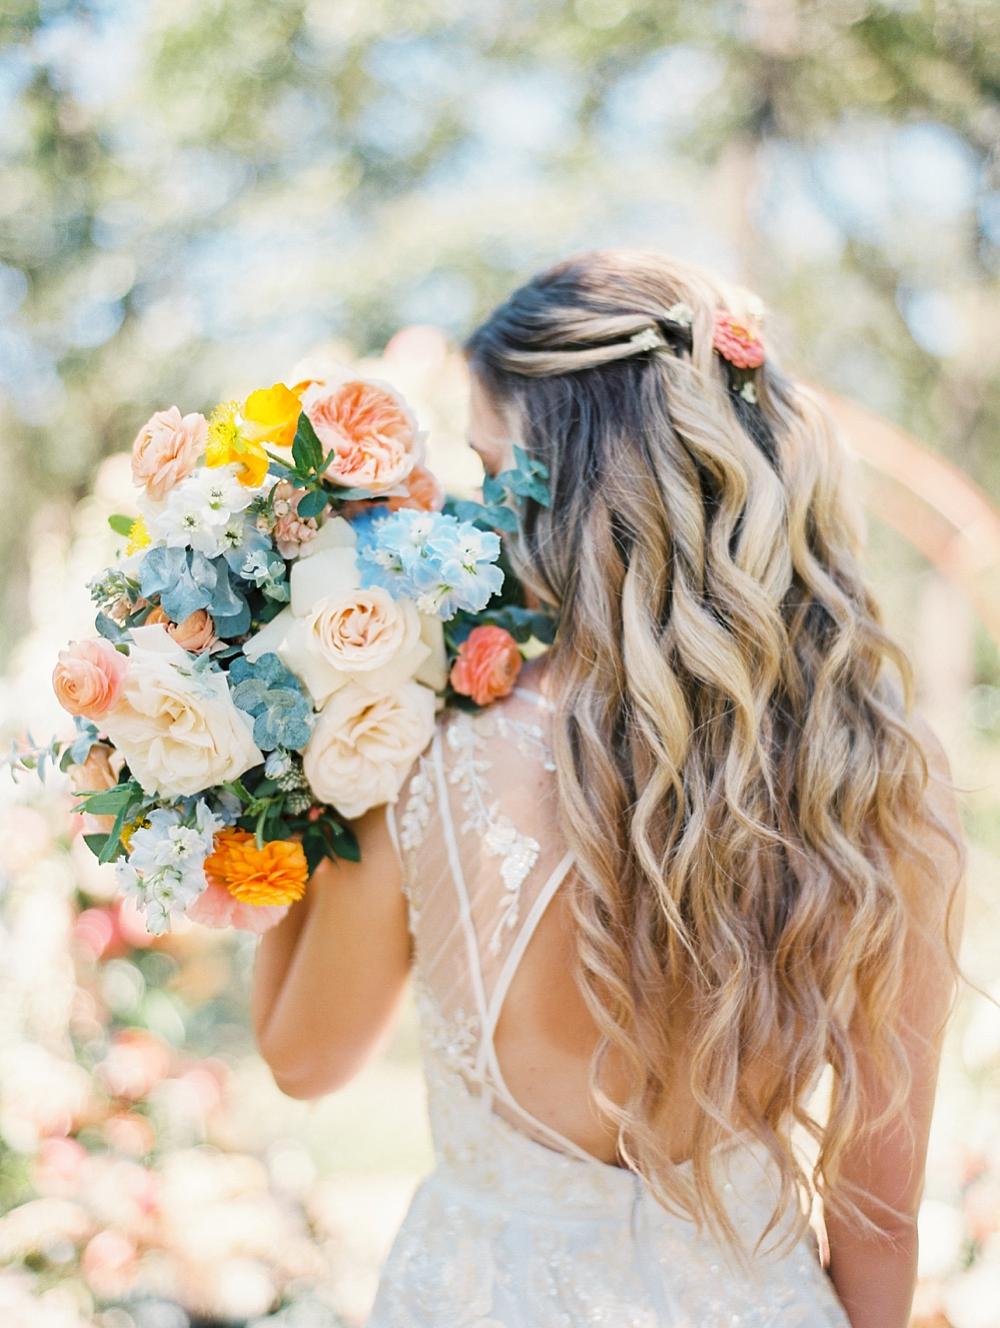 Kristin-La-Voie-Photography-Austin-Wedding-Photographer-the-grand-lady-17